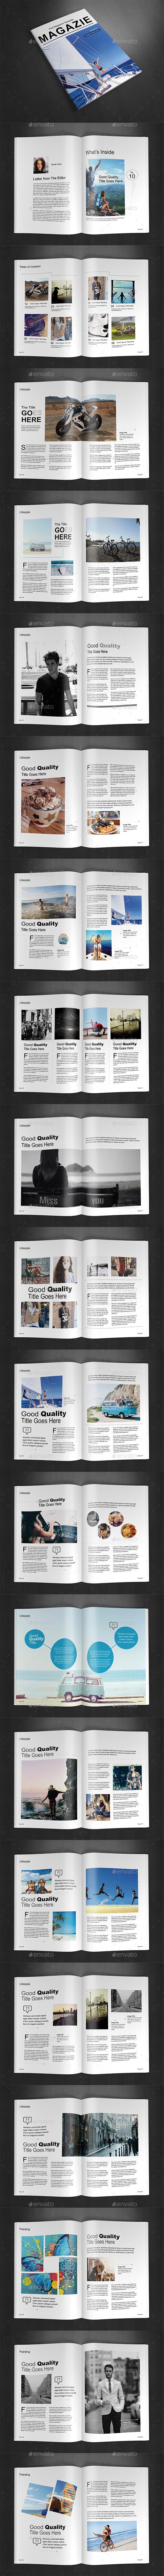 A4 Magazine Template Vol.14 - Magazines Print Templates